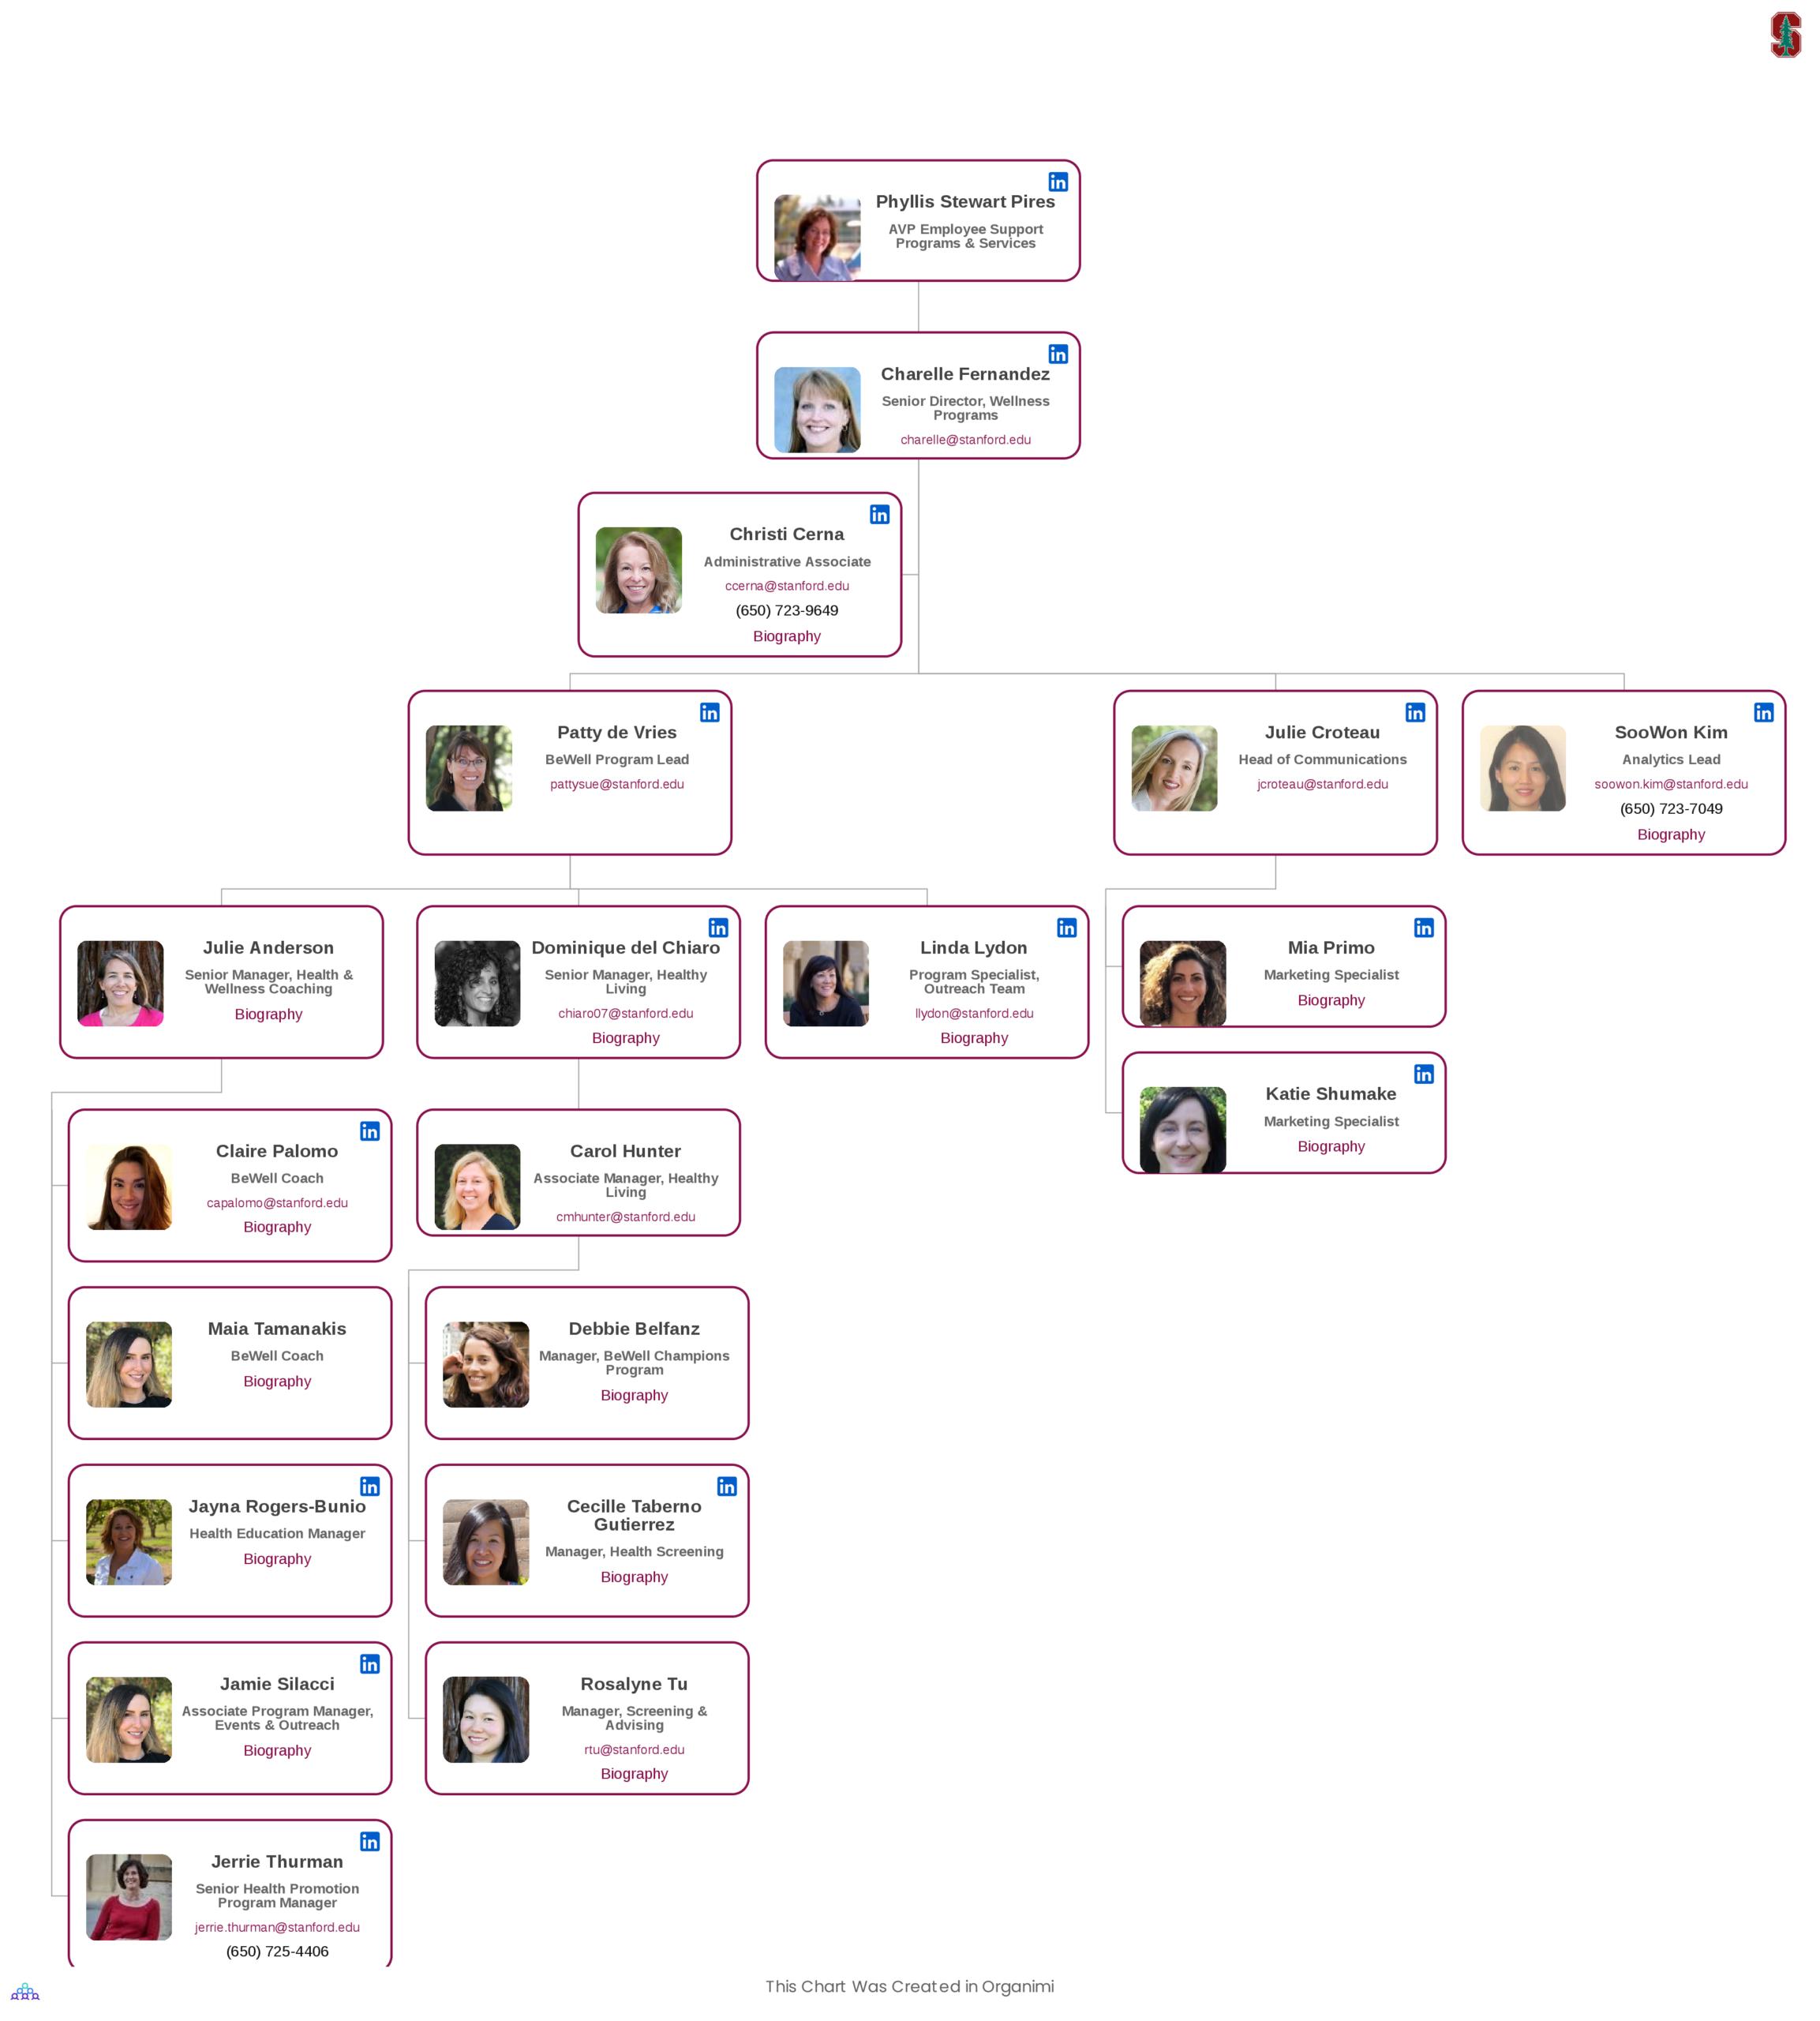 Stanford's Organizational Structure